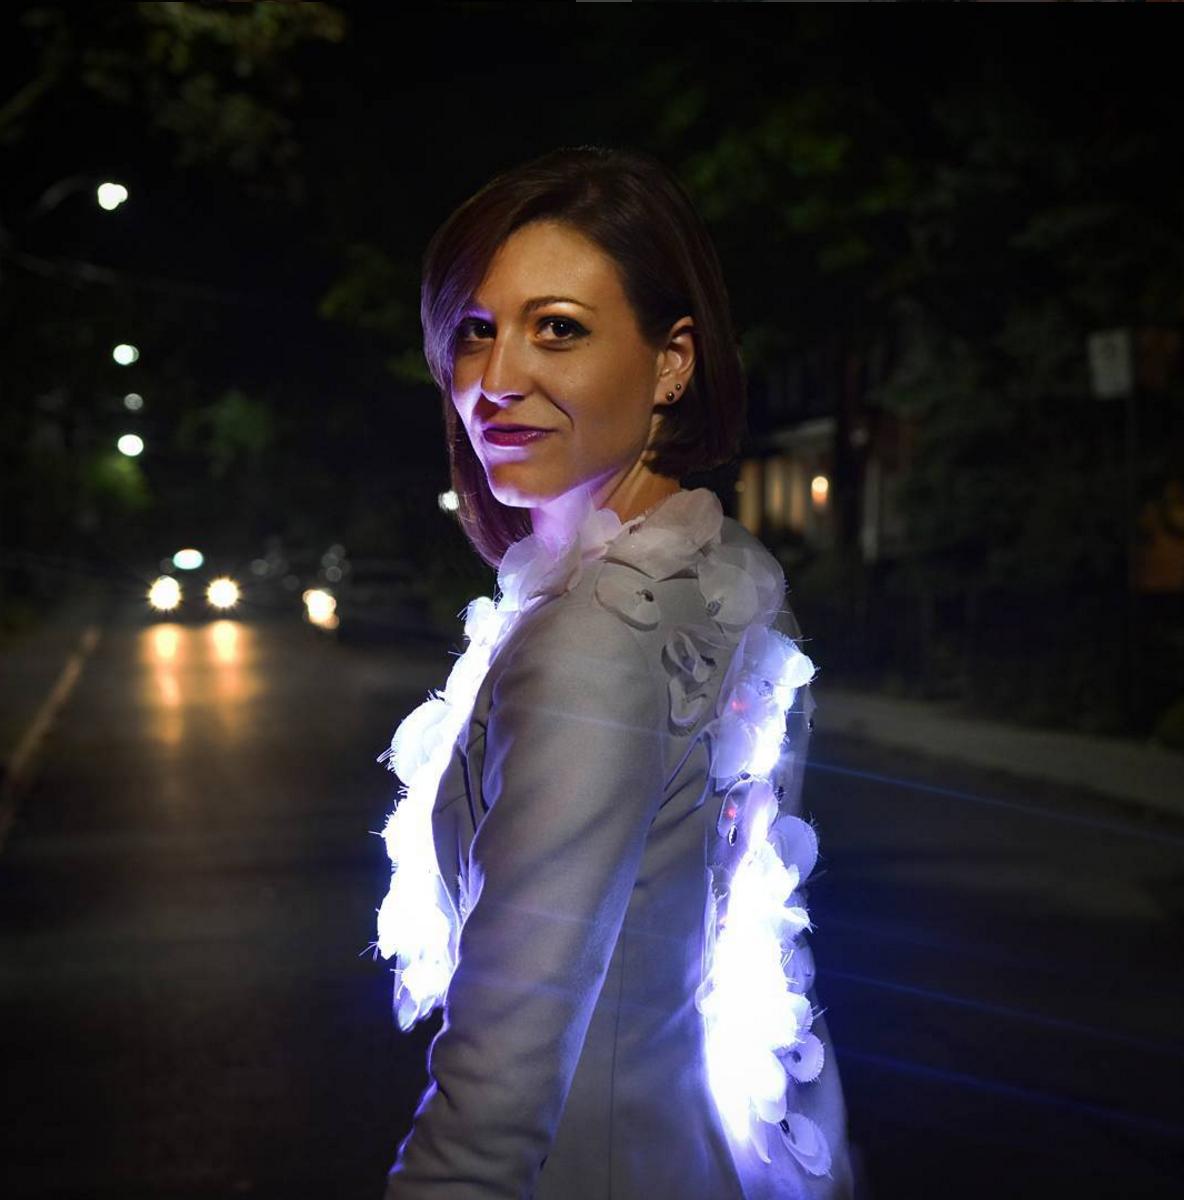 Amanda in illuminated jacket by Laura Dempsey